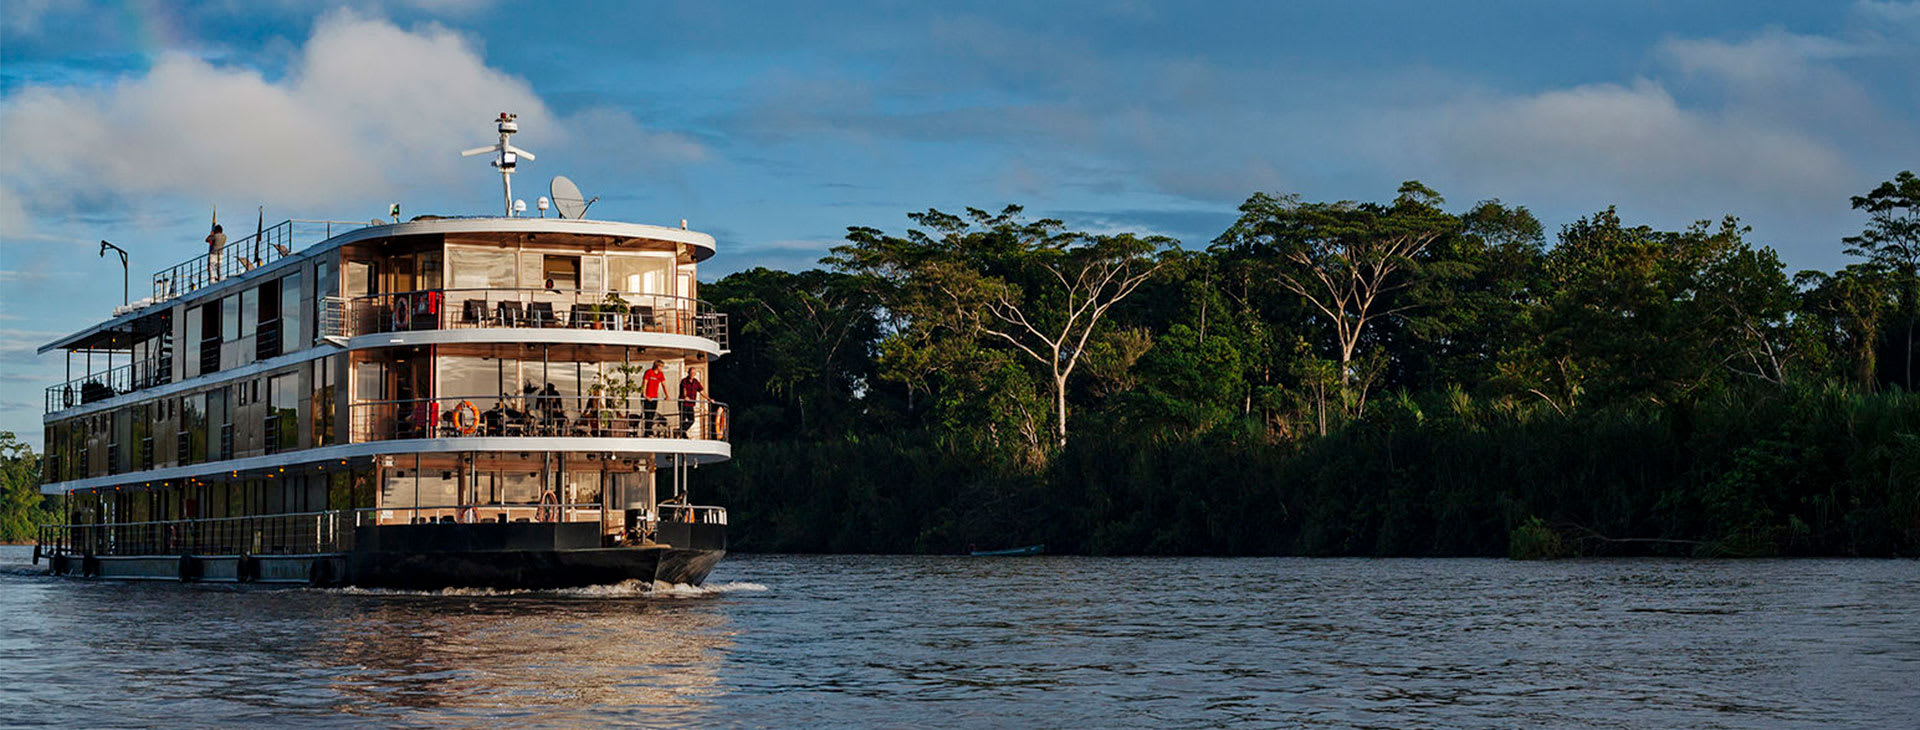 Anakonda Amazon River Cruise Ship